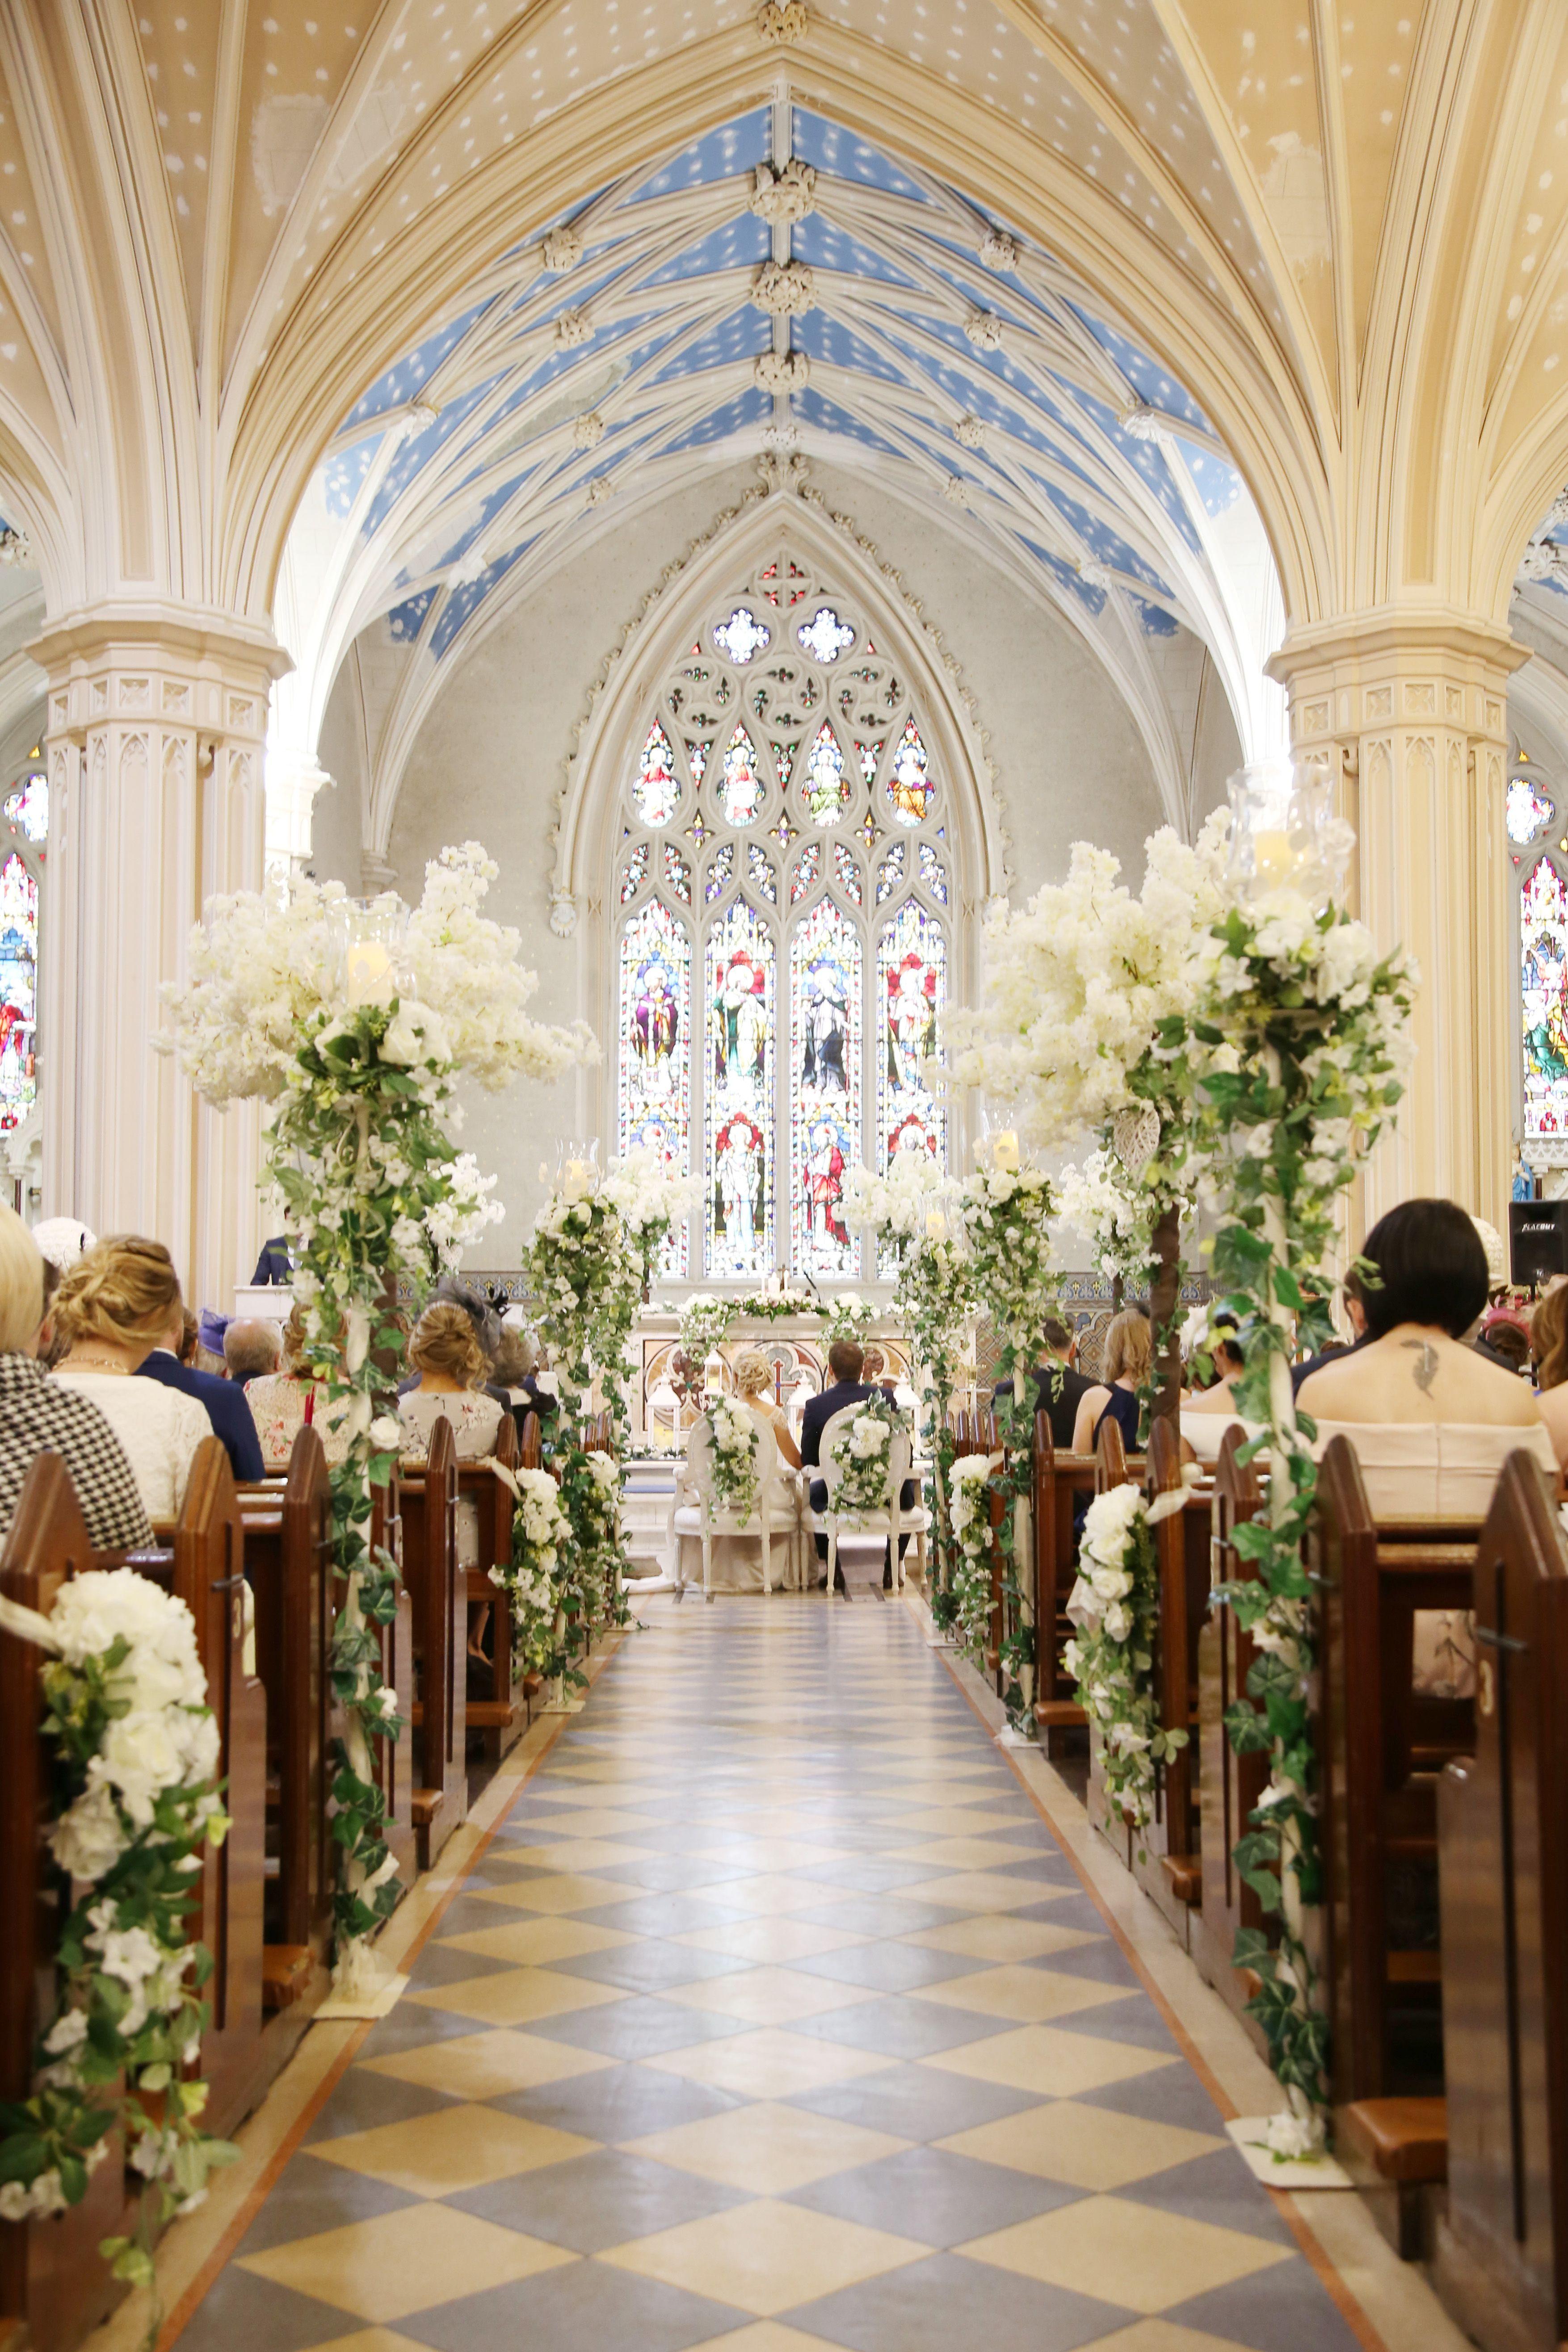 P I N T E R E S T Letty Wedding Chapel Decorations Wedding Aisle Decorations Church Wedding Decorations